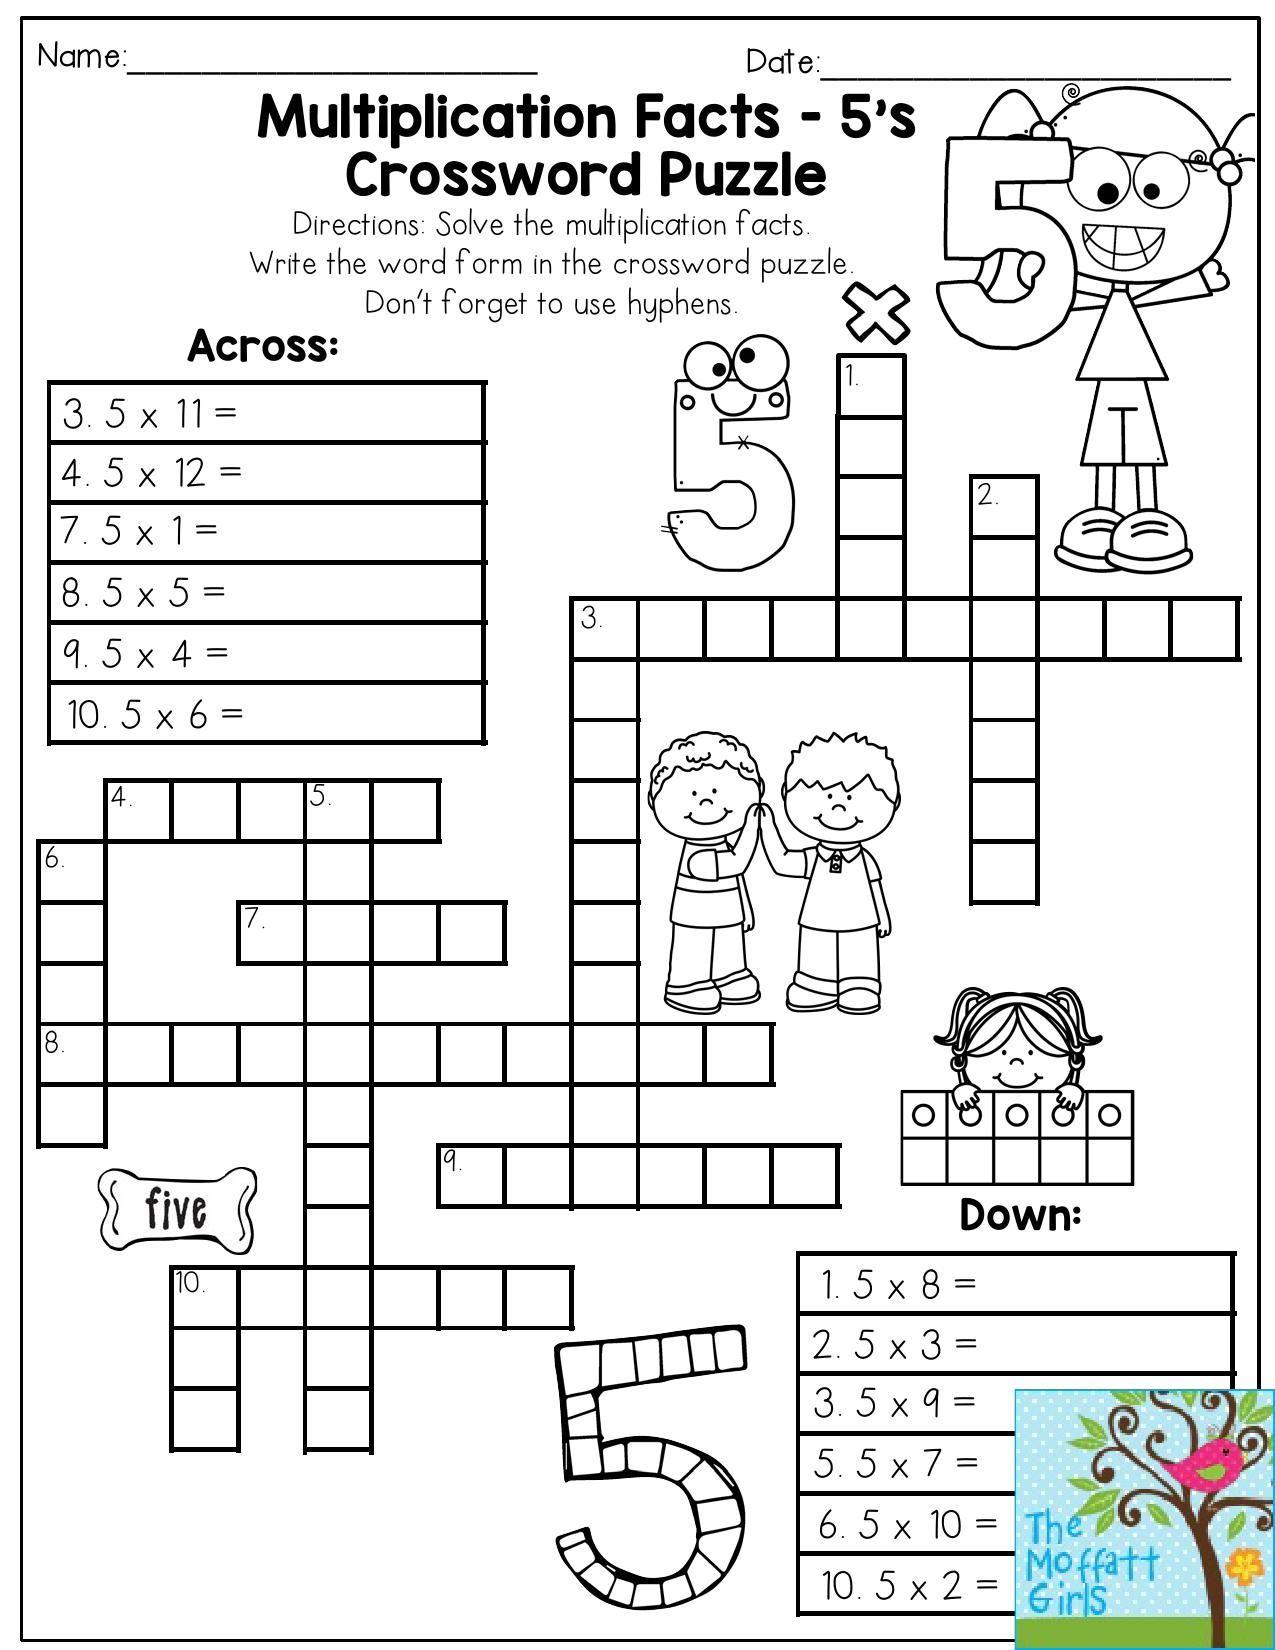 5th Grade Crossword Puzzles Printable